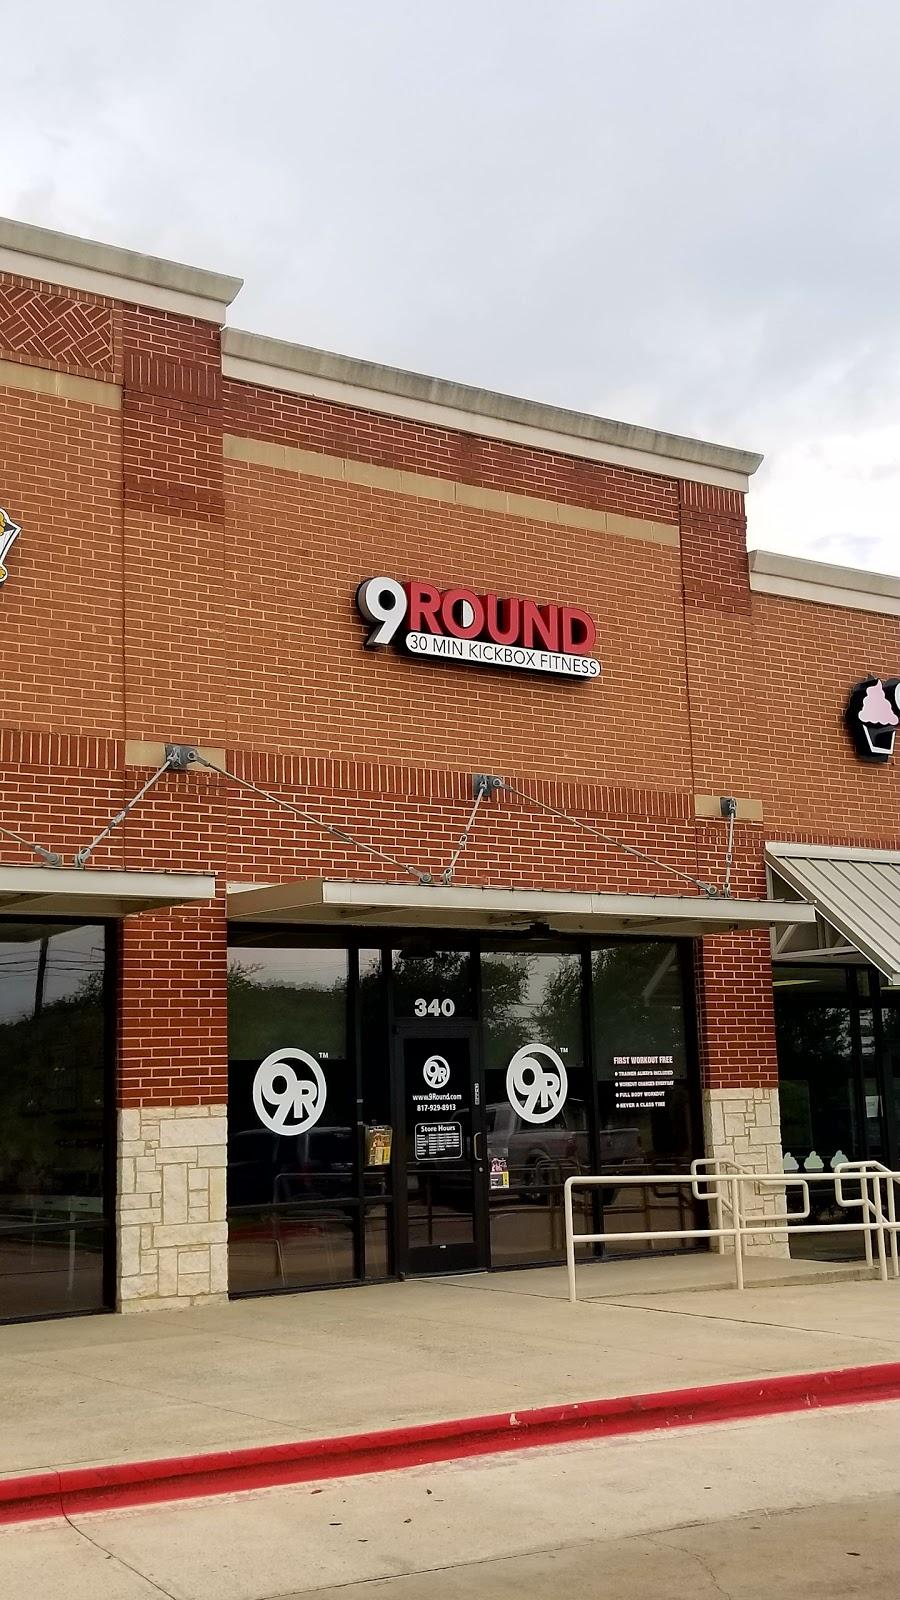 9Round Keller - gym  | Photo 5 of 7 | Address: 900 S Main St #340, Keller, TX 76248, USA | Phone: (817) 929-8913